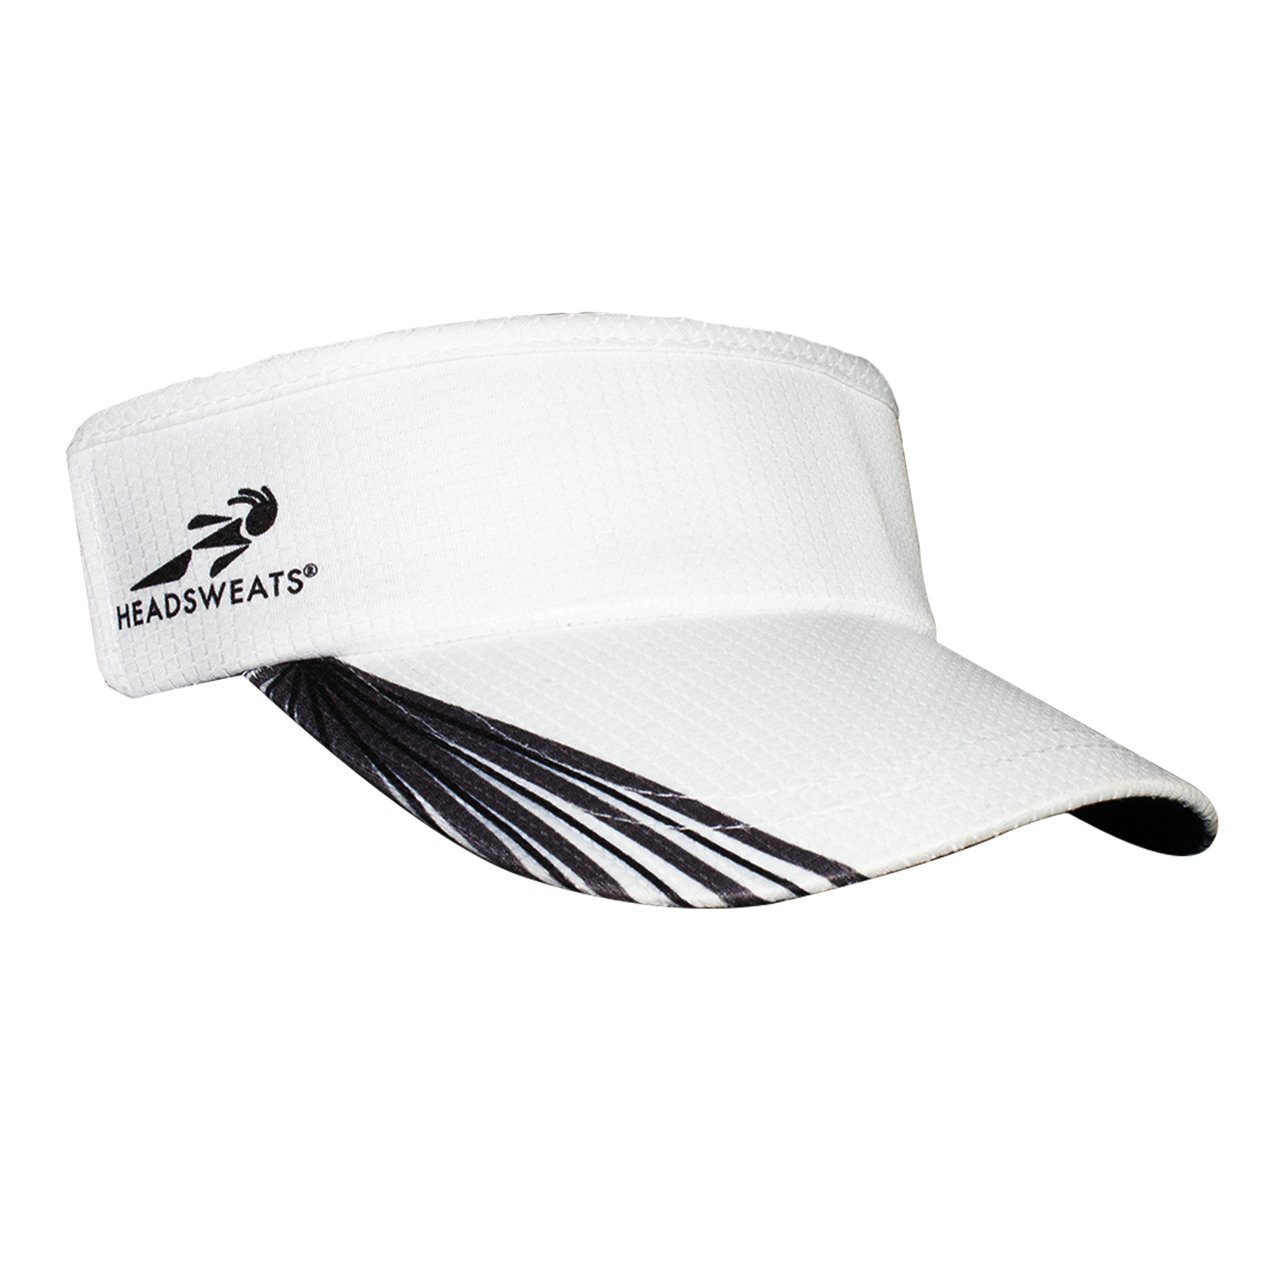 Headsweats Supervisor Grid Headwear Grey/Black/White One Size